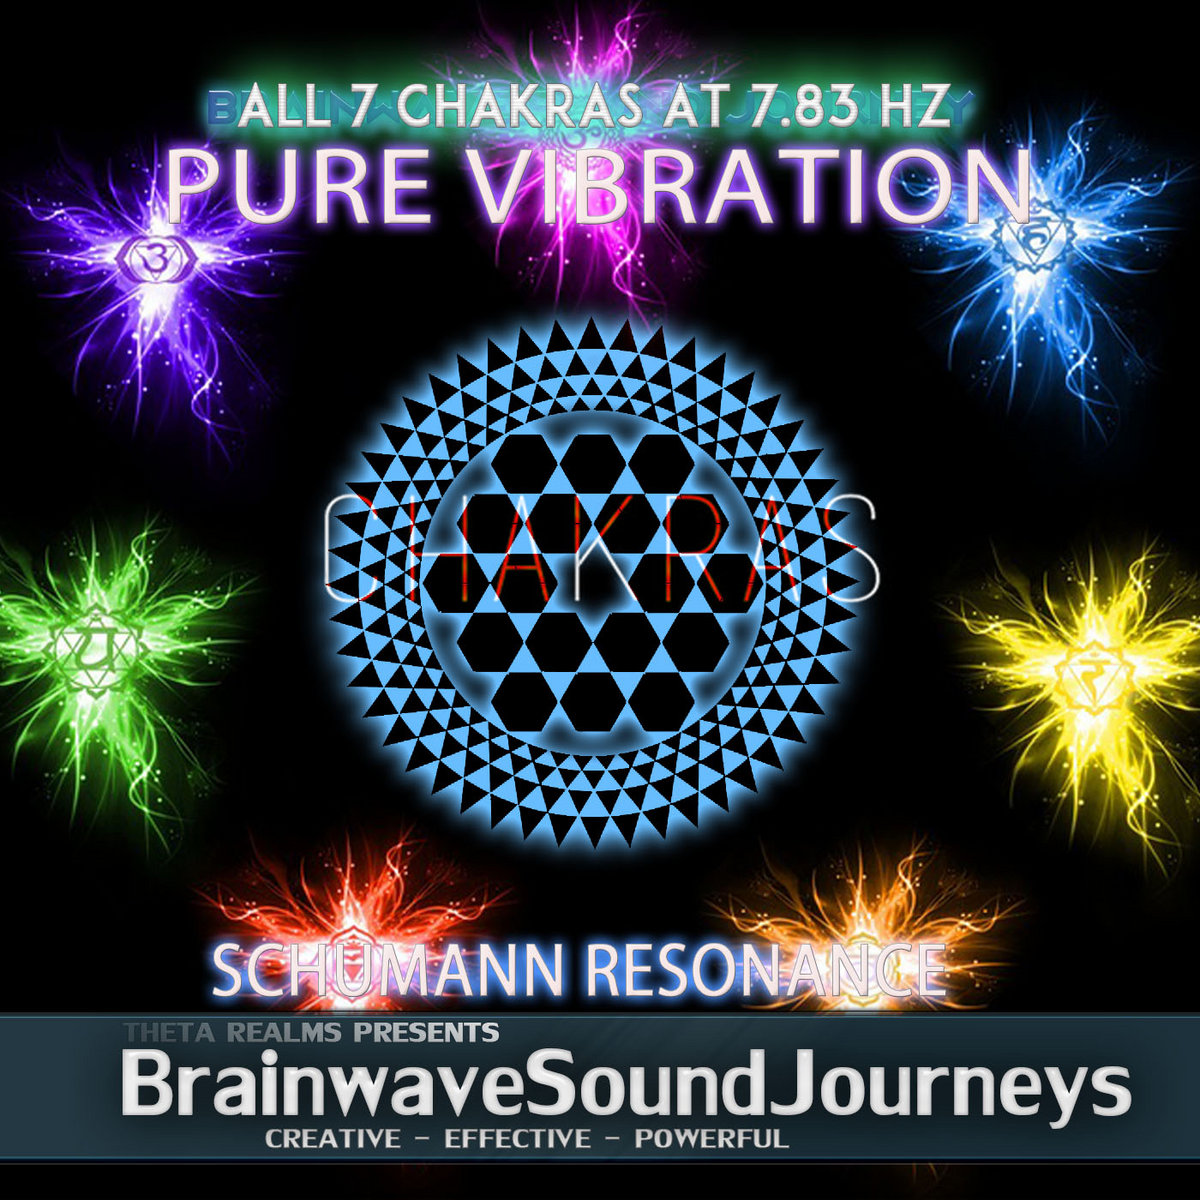 ALL 7 CHAKRAS - 7 83 SCHUMANN RESONANCE - PURE TONES MEDITATION